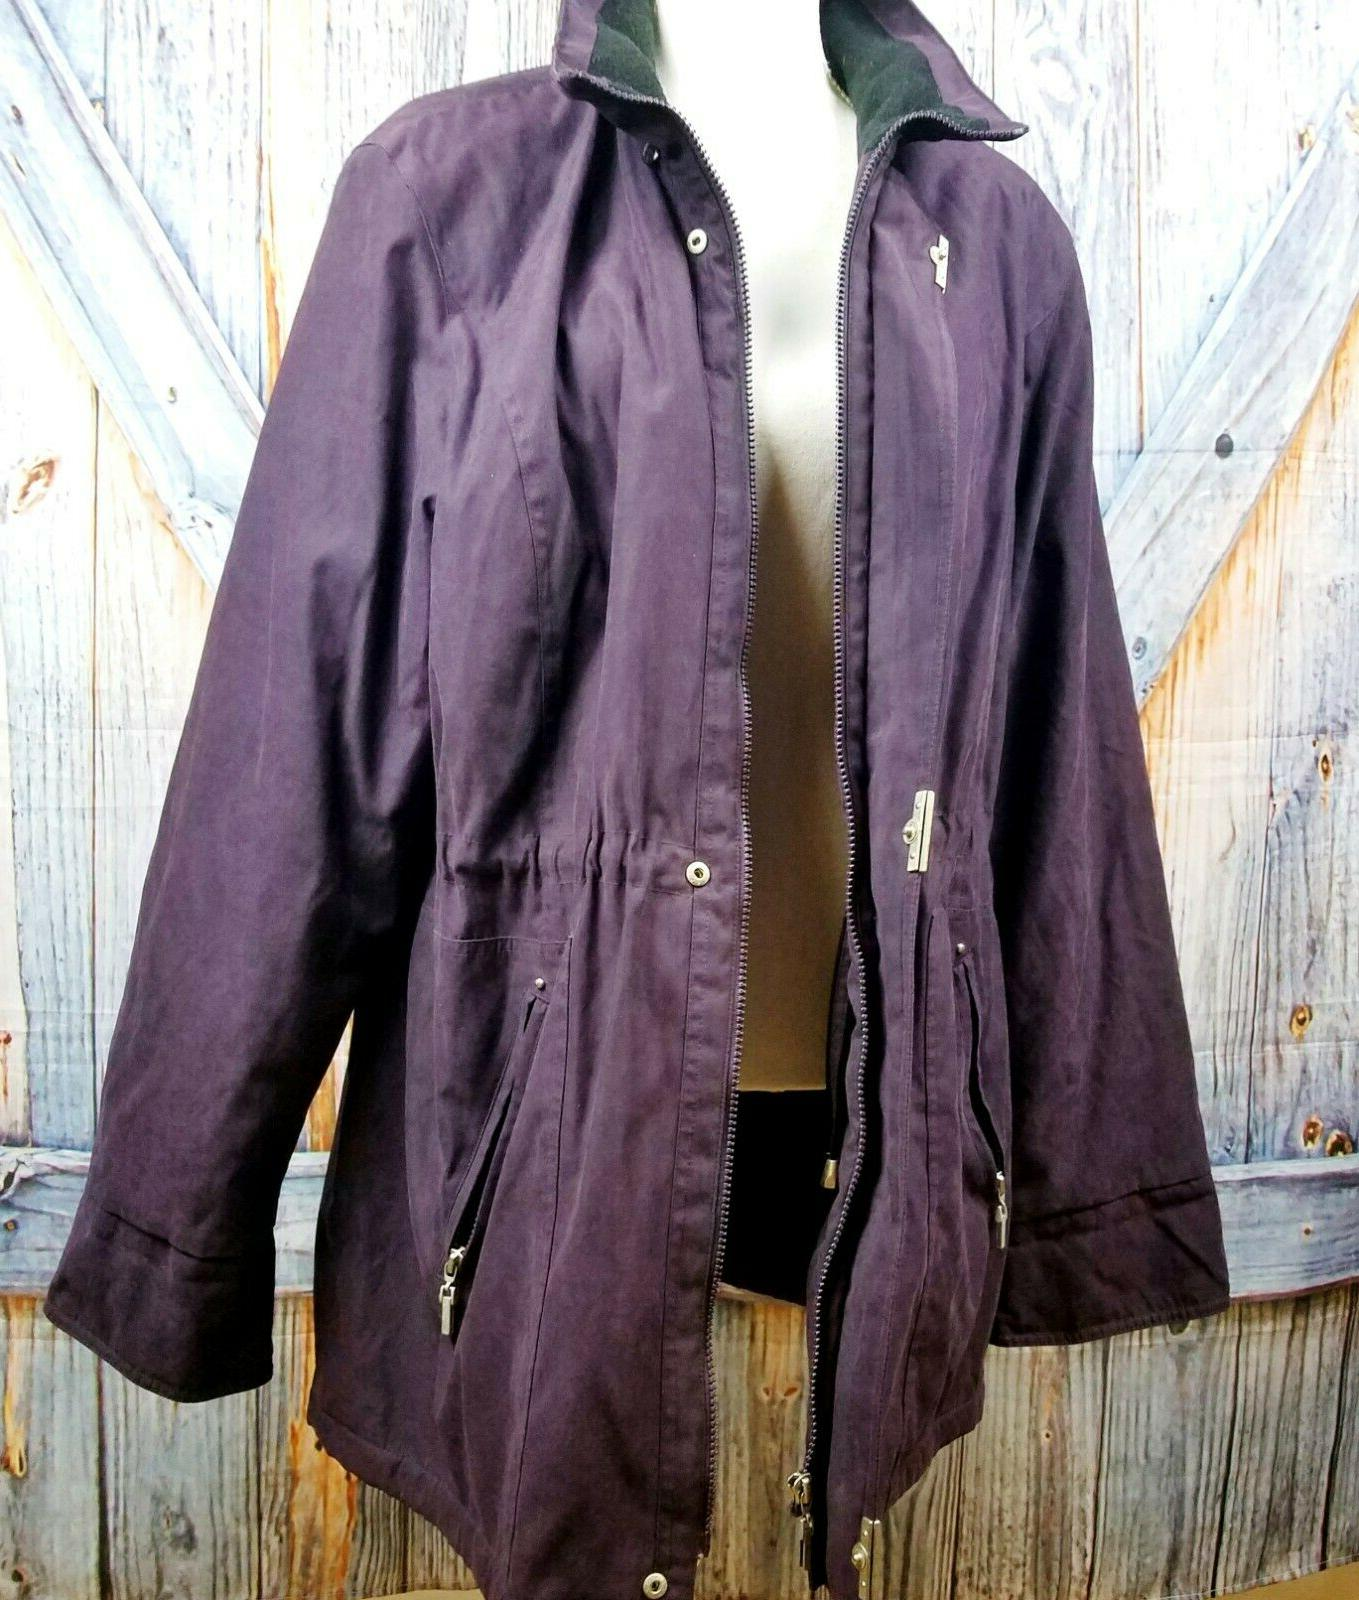 Ski Coat Wind Resistant 1x